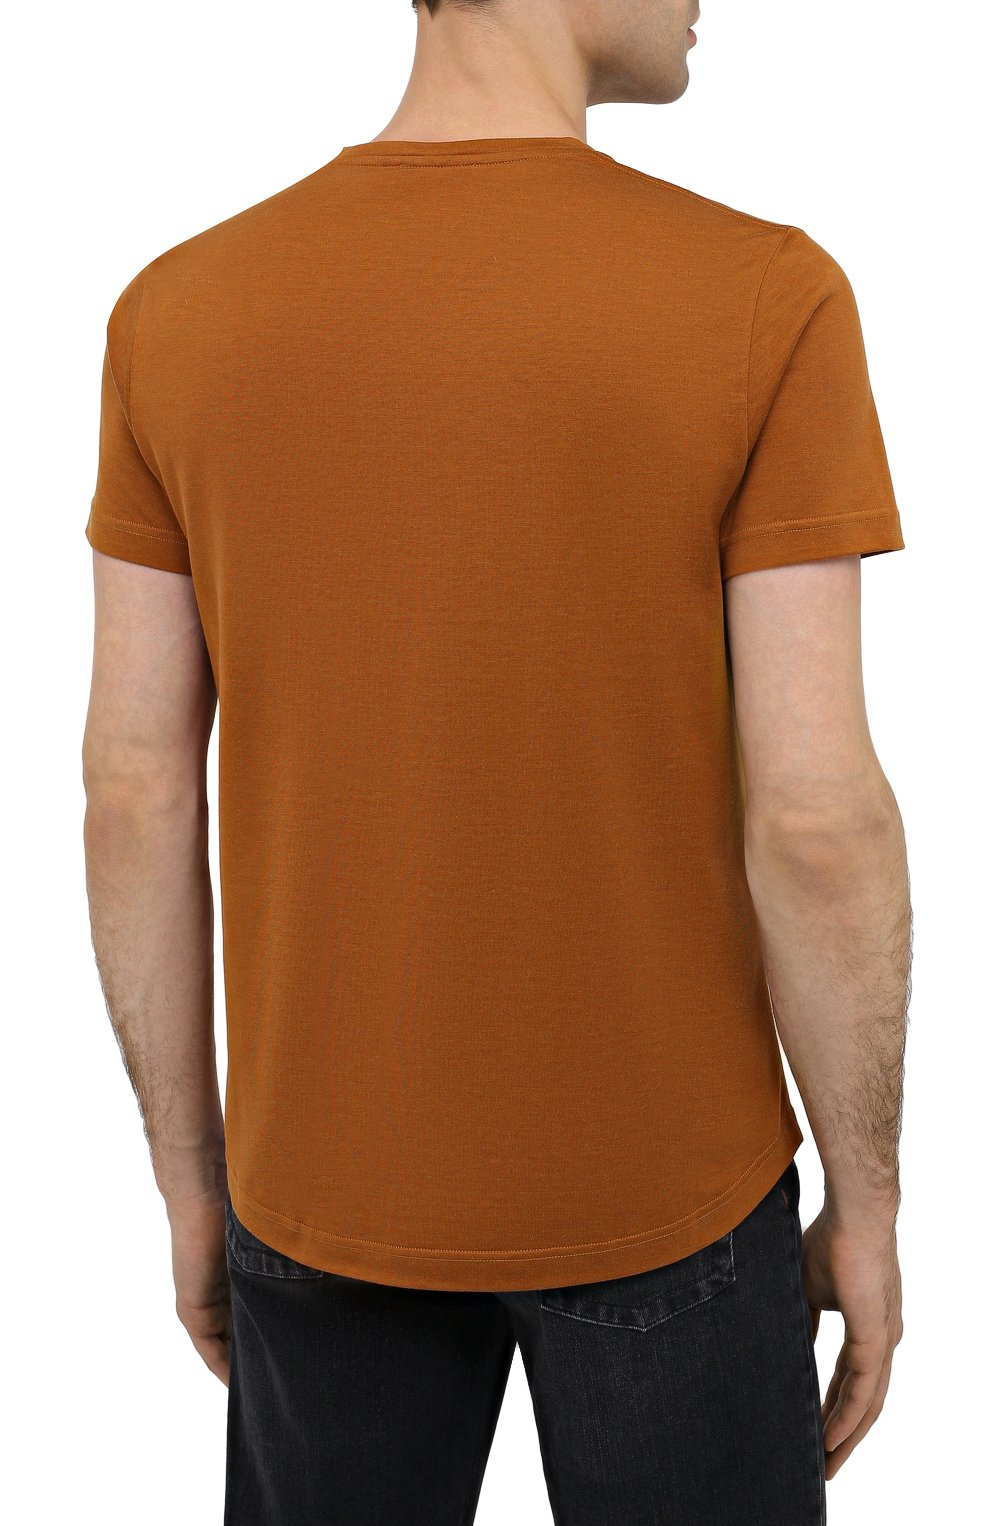 Мужская футболка из шелка и хлопка LORO PIANA светло-коричневого цвета, арт. FAF6128 | Фото 4